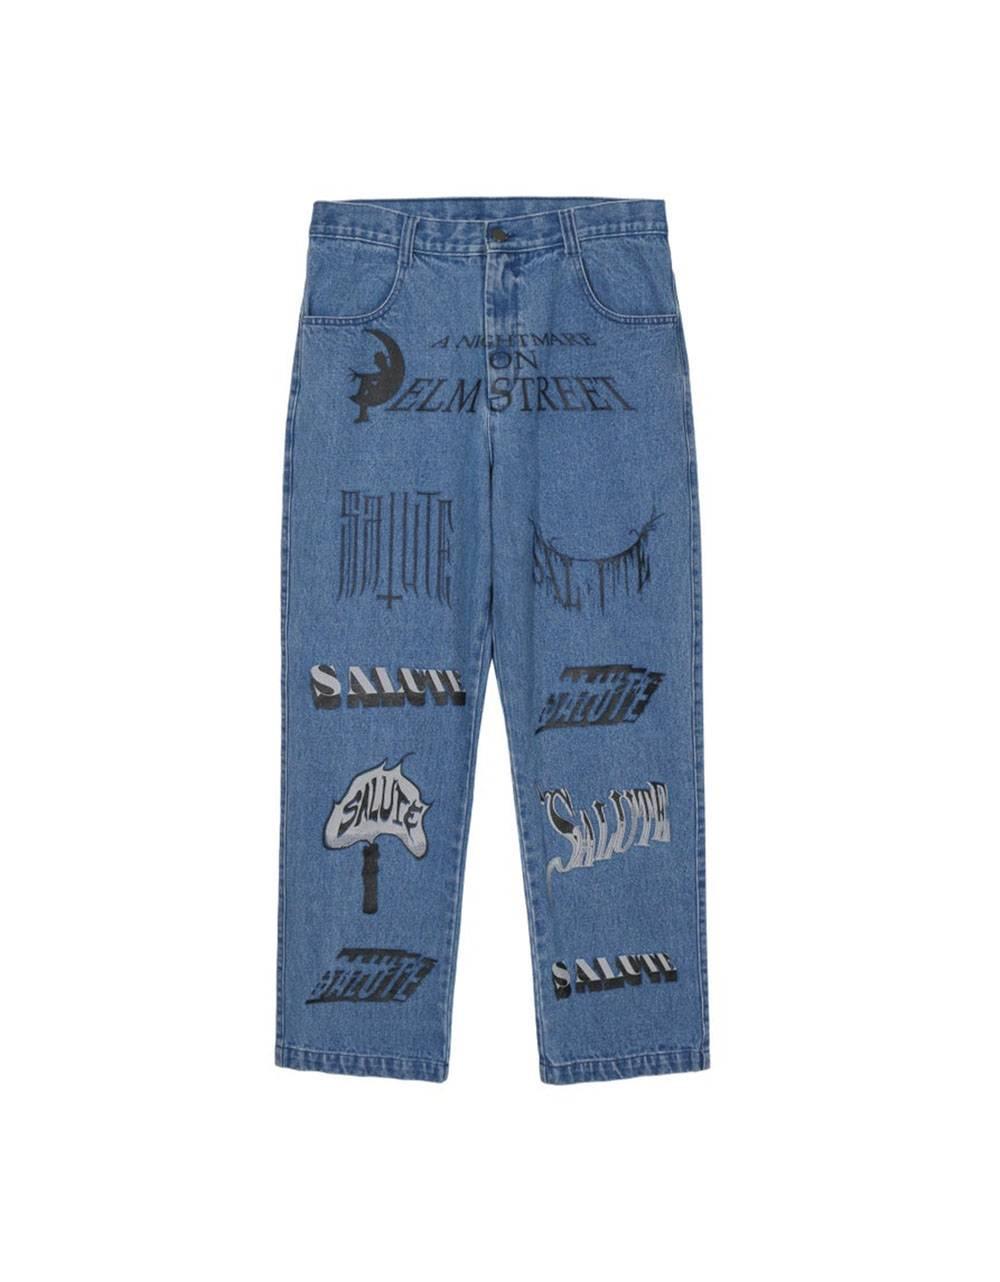 Salute HK Logo printed jeans - light washed blue Salute HK Jeans 186,00€